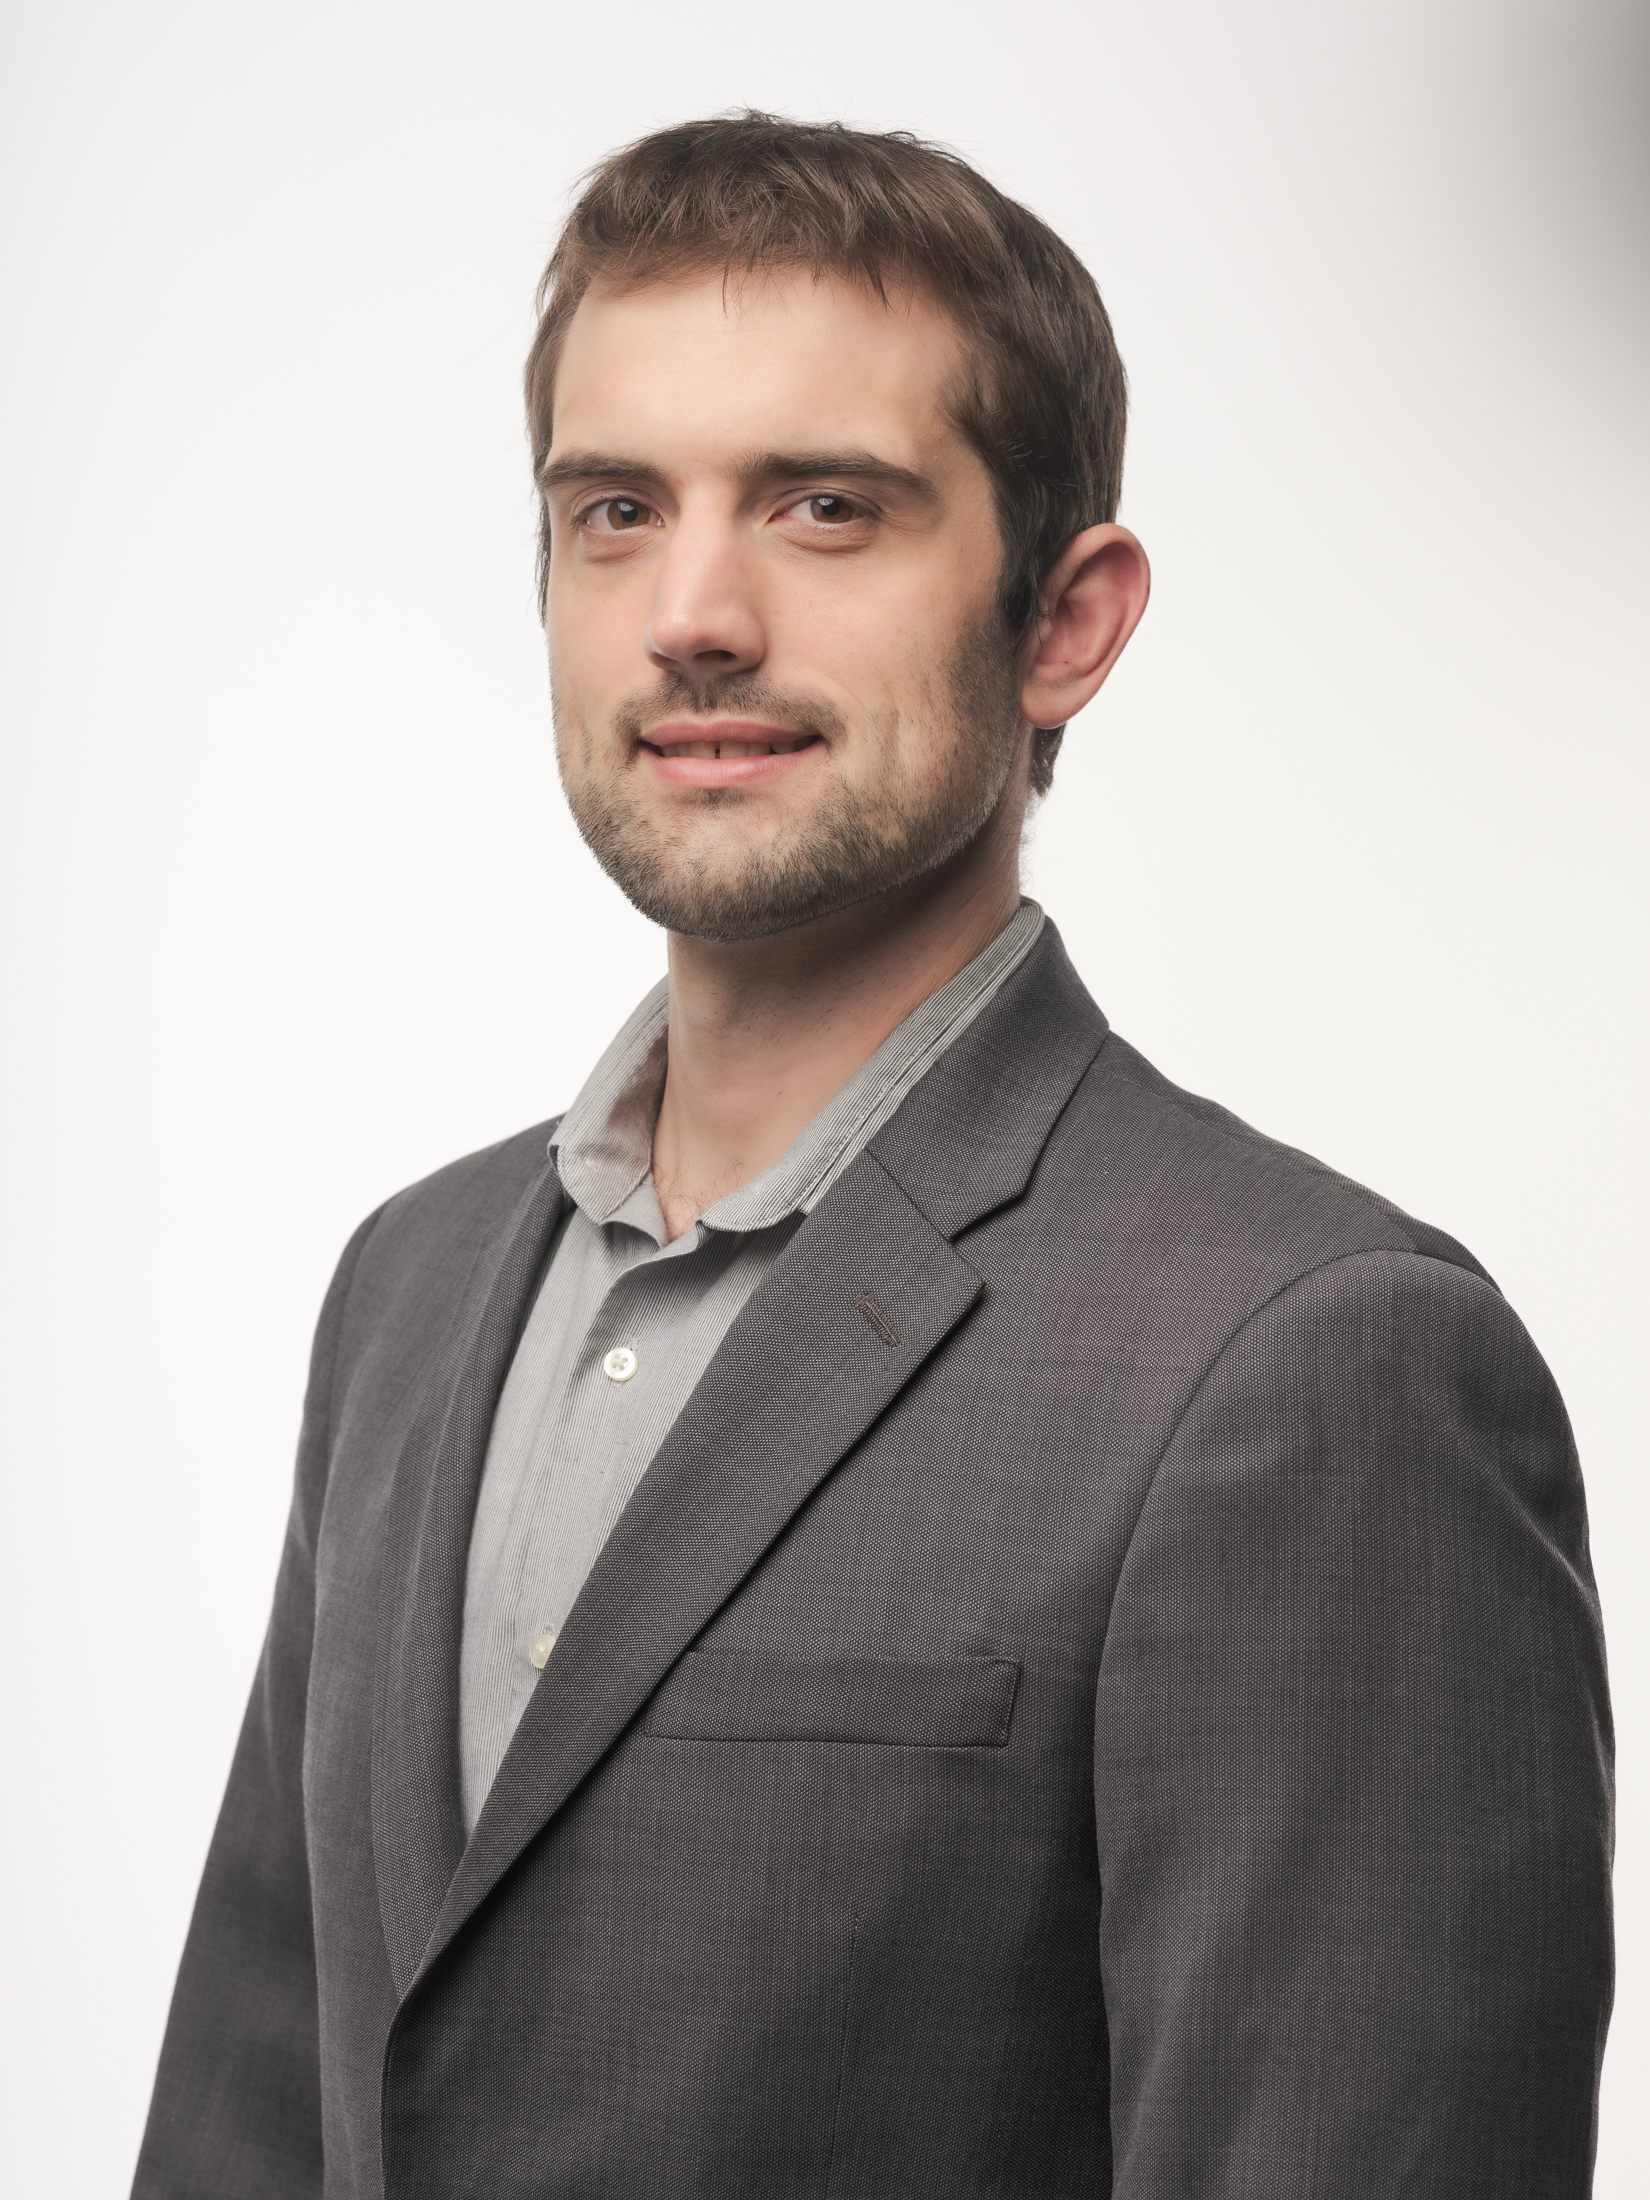 Jim Petrovic